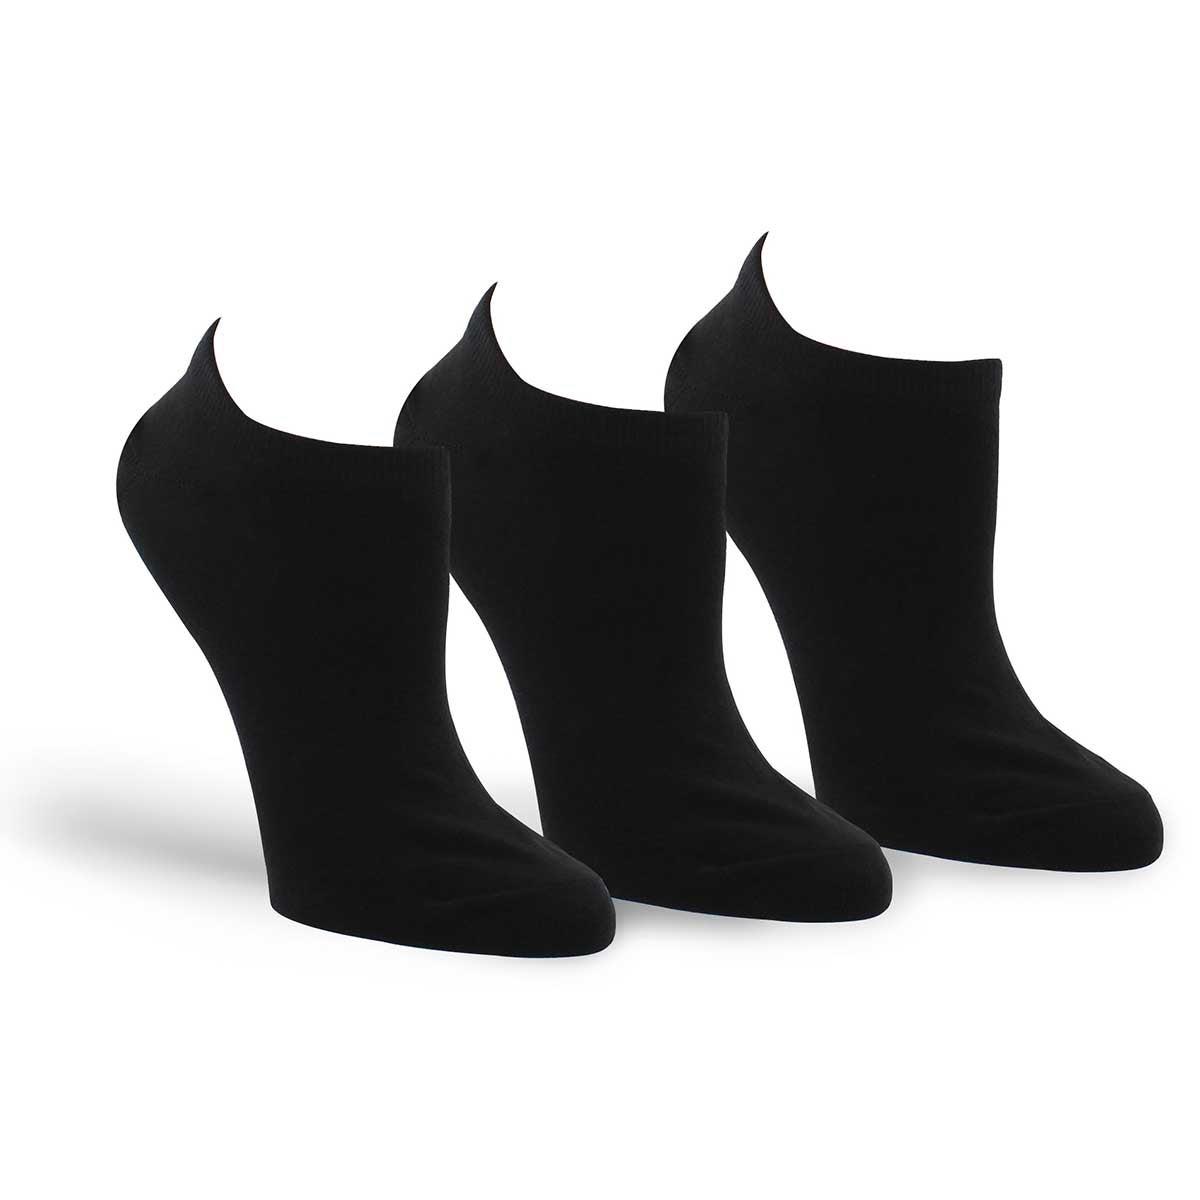 Women's CONVERSE black ankle socks - 3 pack